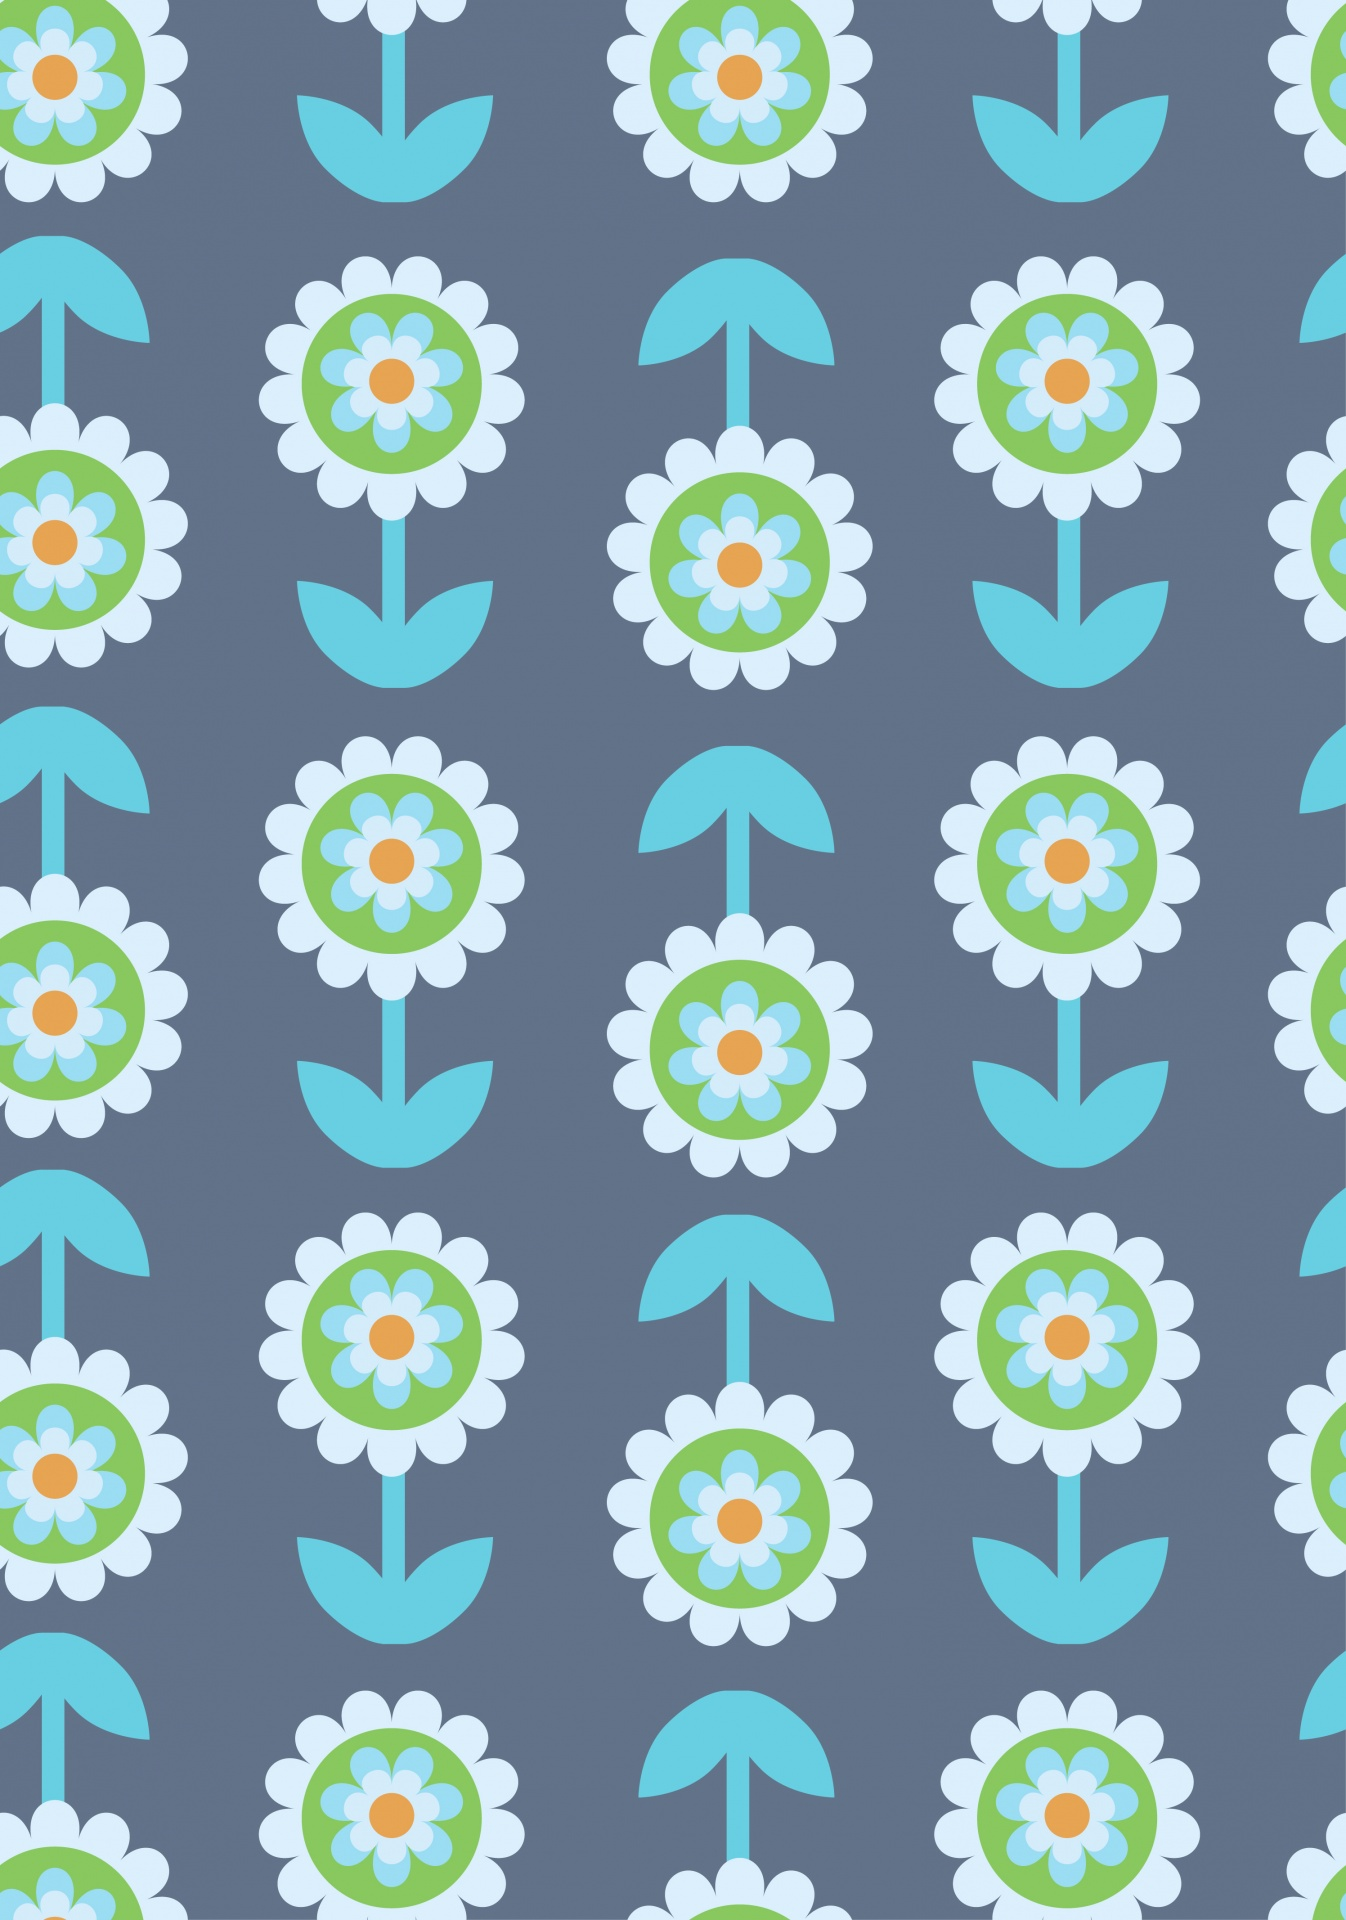 Retro Flowers Floral Flower Wallpaper Free Image From Needpix Com